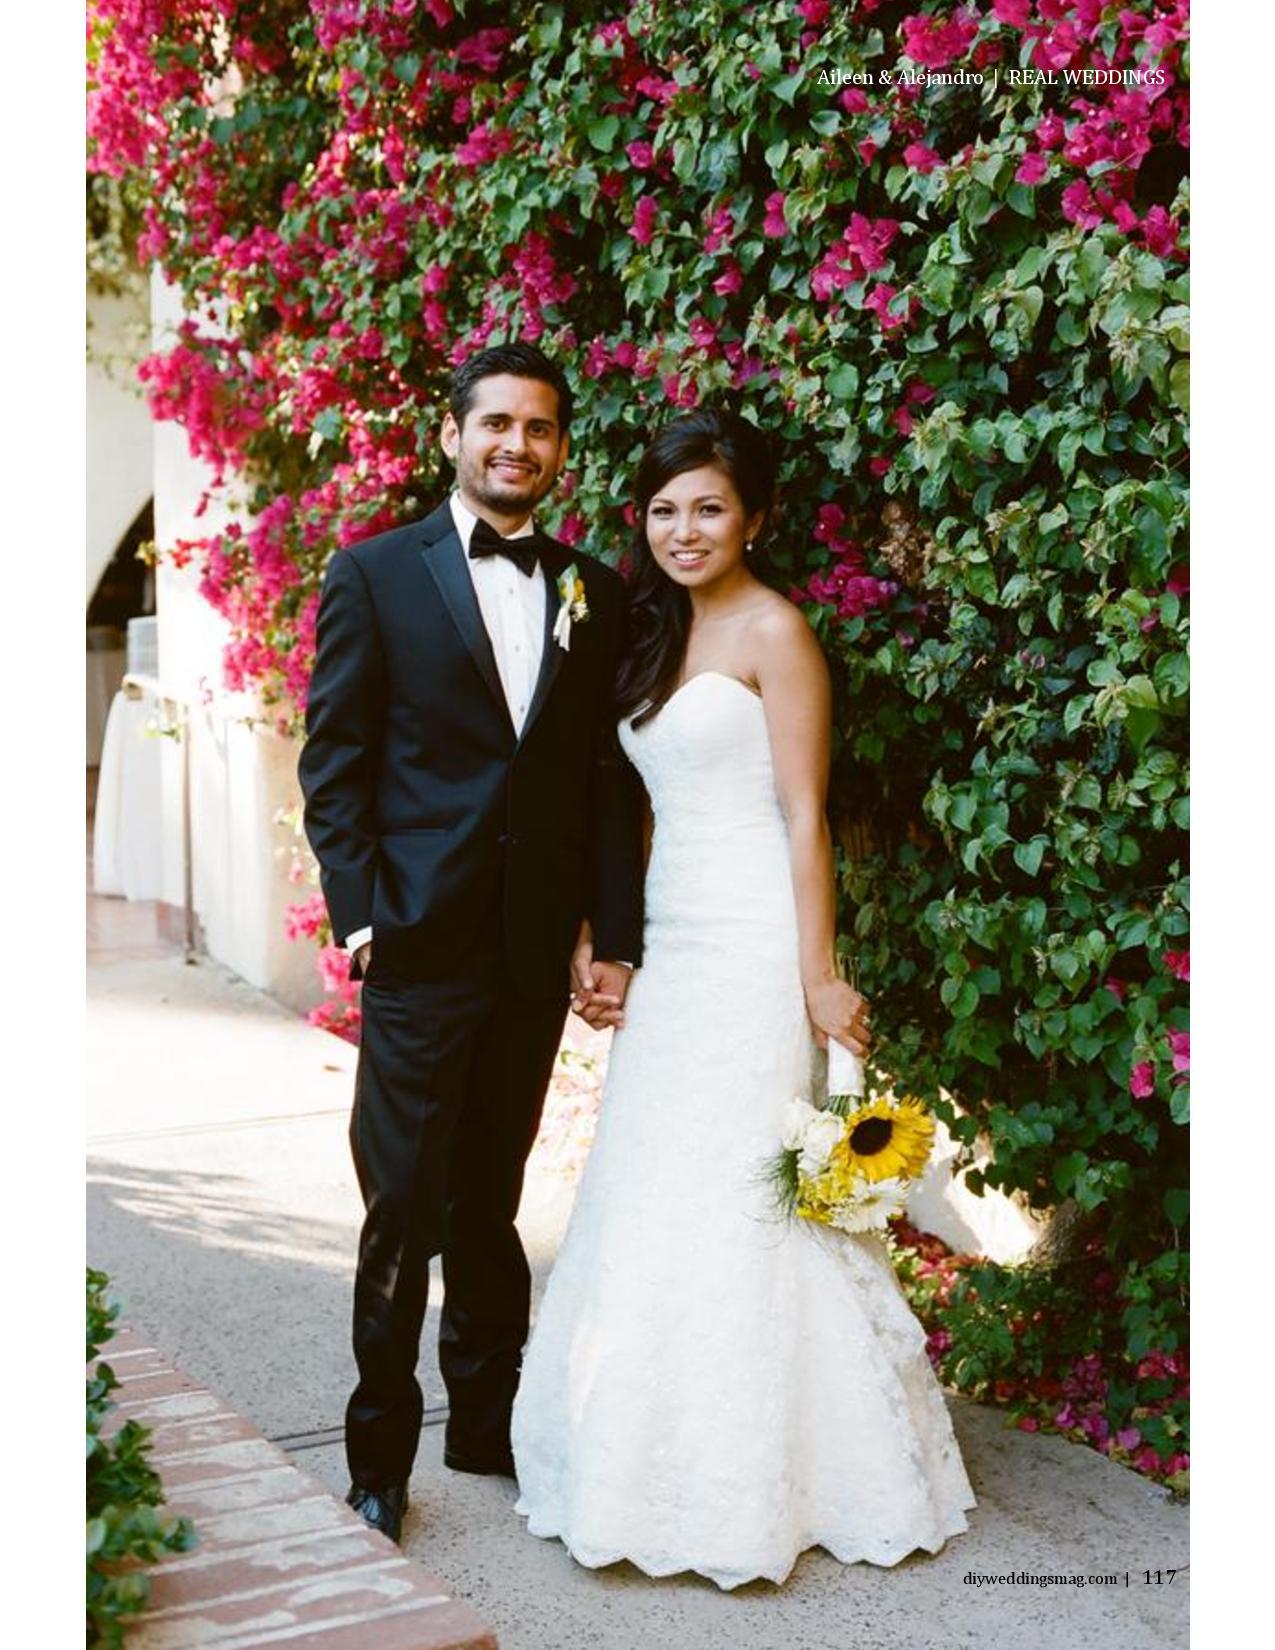 Aileen & Alejandro-DIY Weddings Mag-page-002.jpg